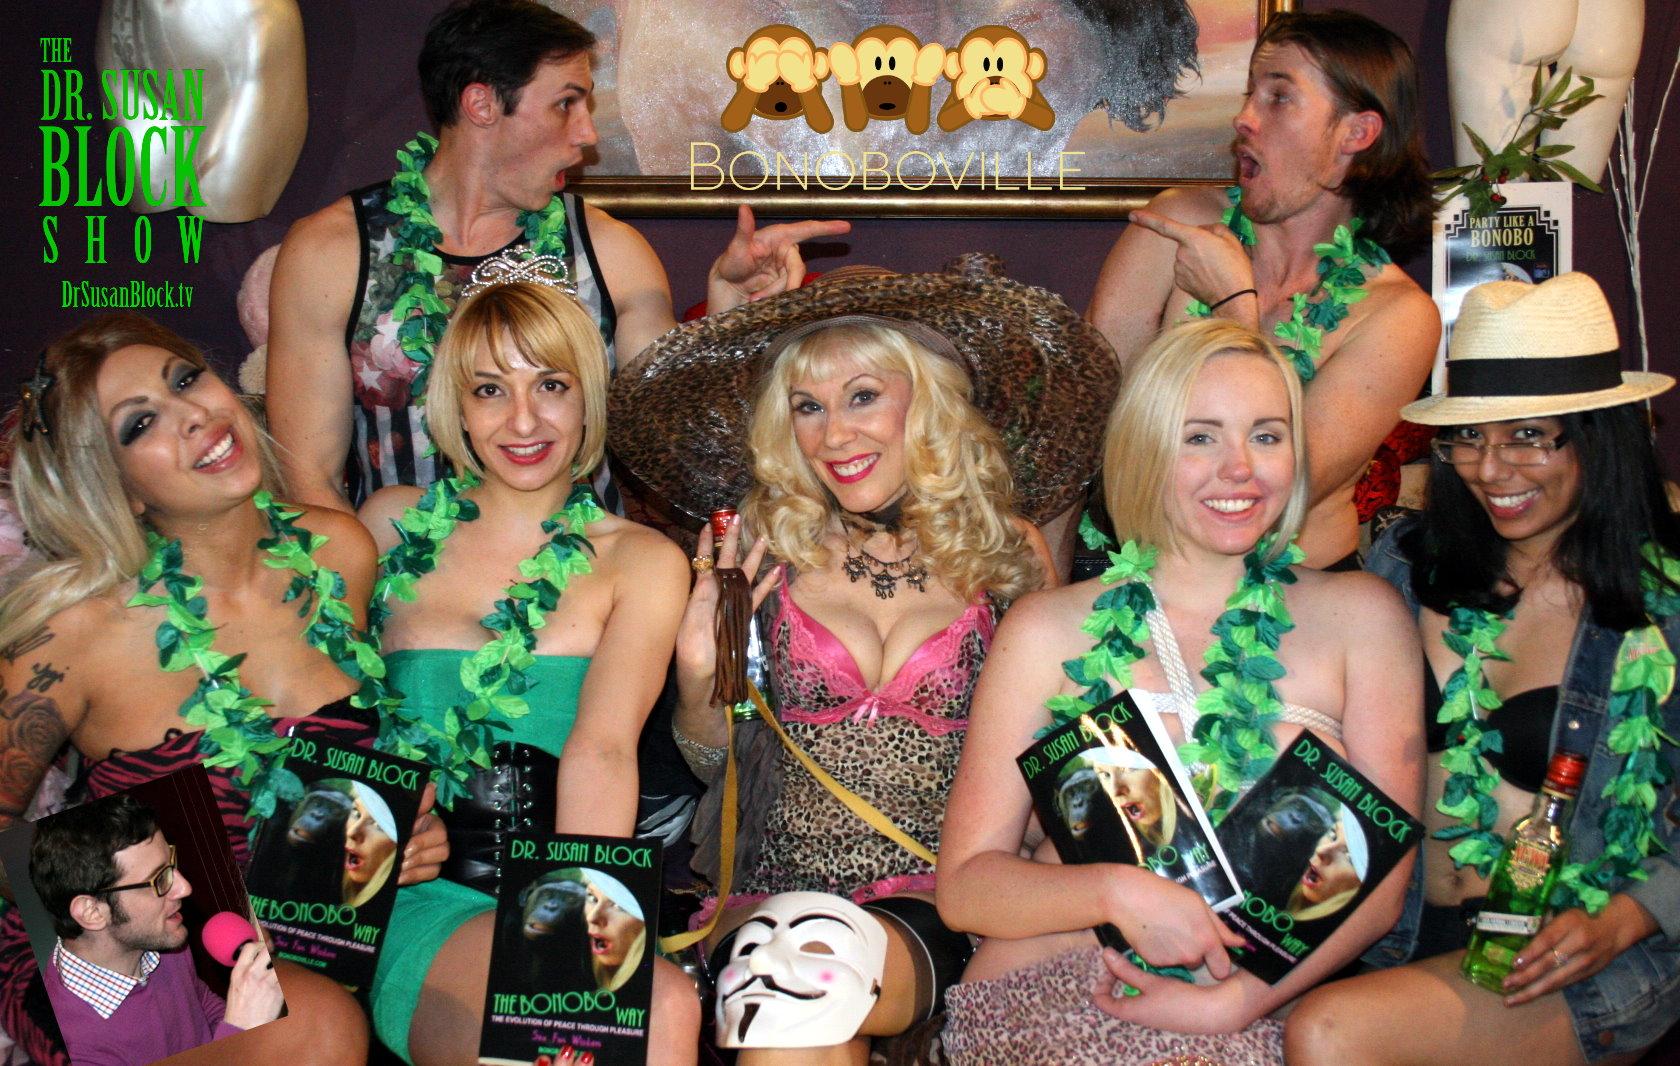 Luzer Twersky, Jessica Shores, Rainey Lane, Dr. Susan Block with Juxleather finger flogger, Miley May, Goddess Maya with Agwa. Row 2: Brett Ravage, Dark Phoenix.